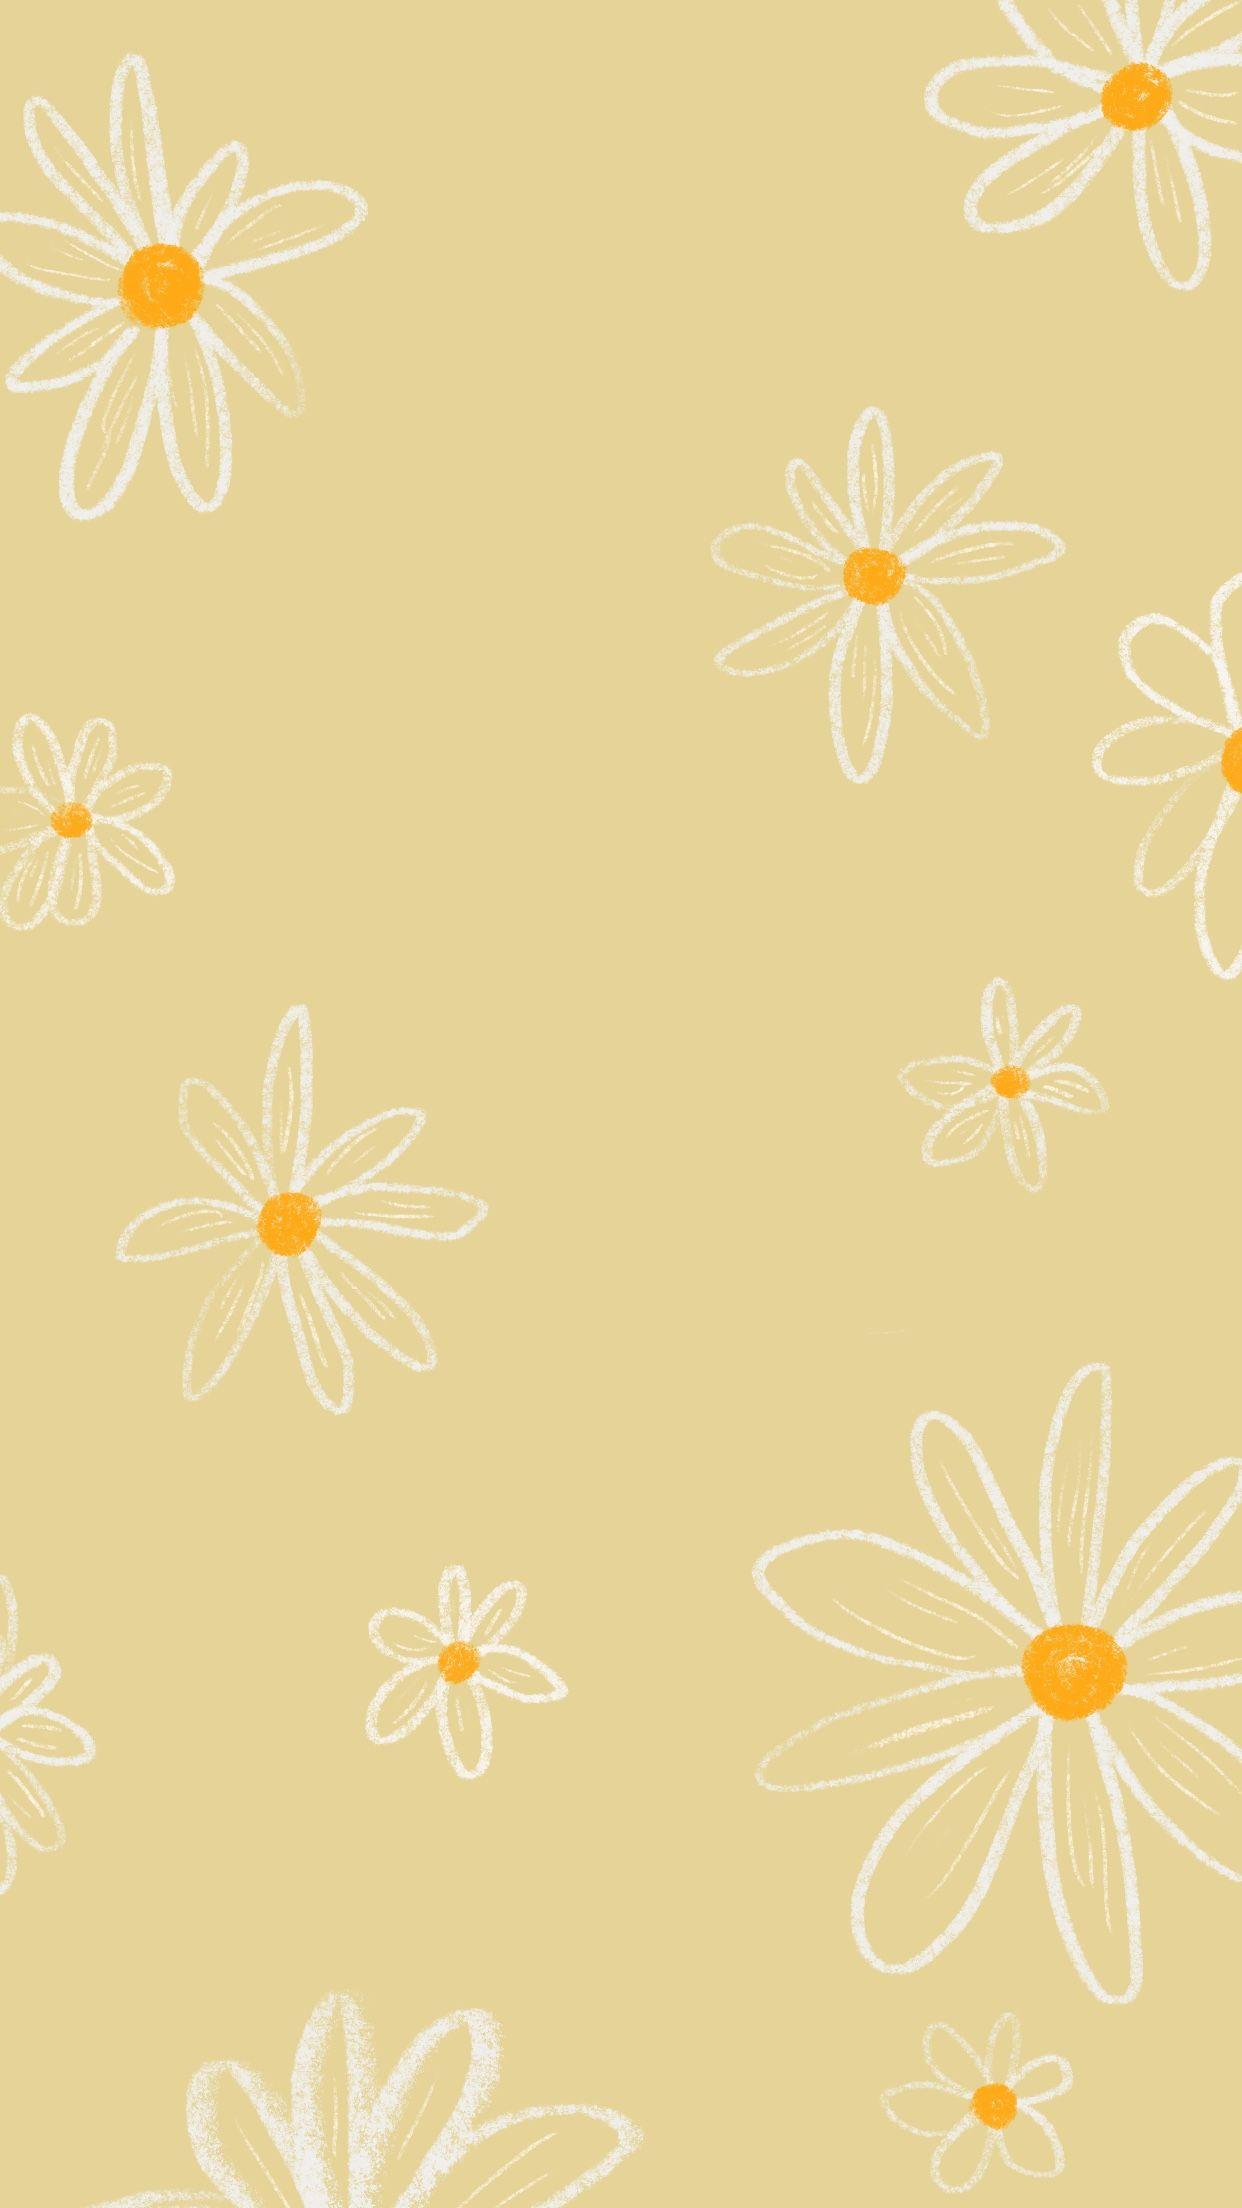 Wallpaper Sunny Yellow Phone Wallpaper Boho Iphone Wallpaper Yellow Wallpaper Iphone Boho